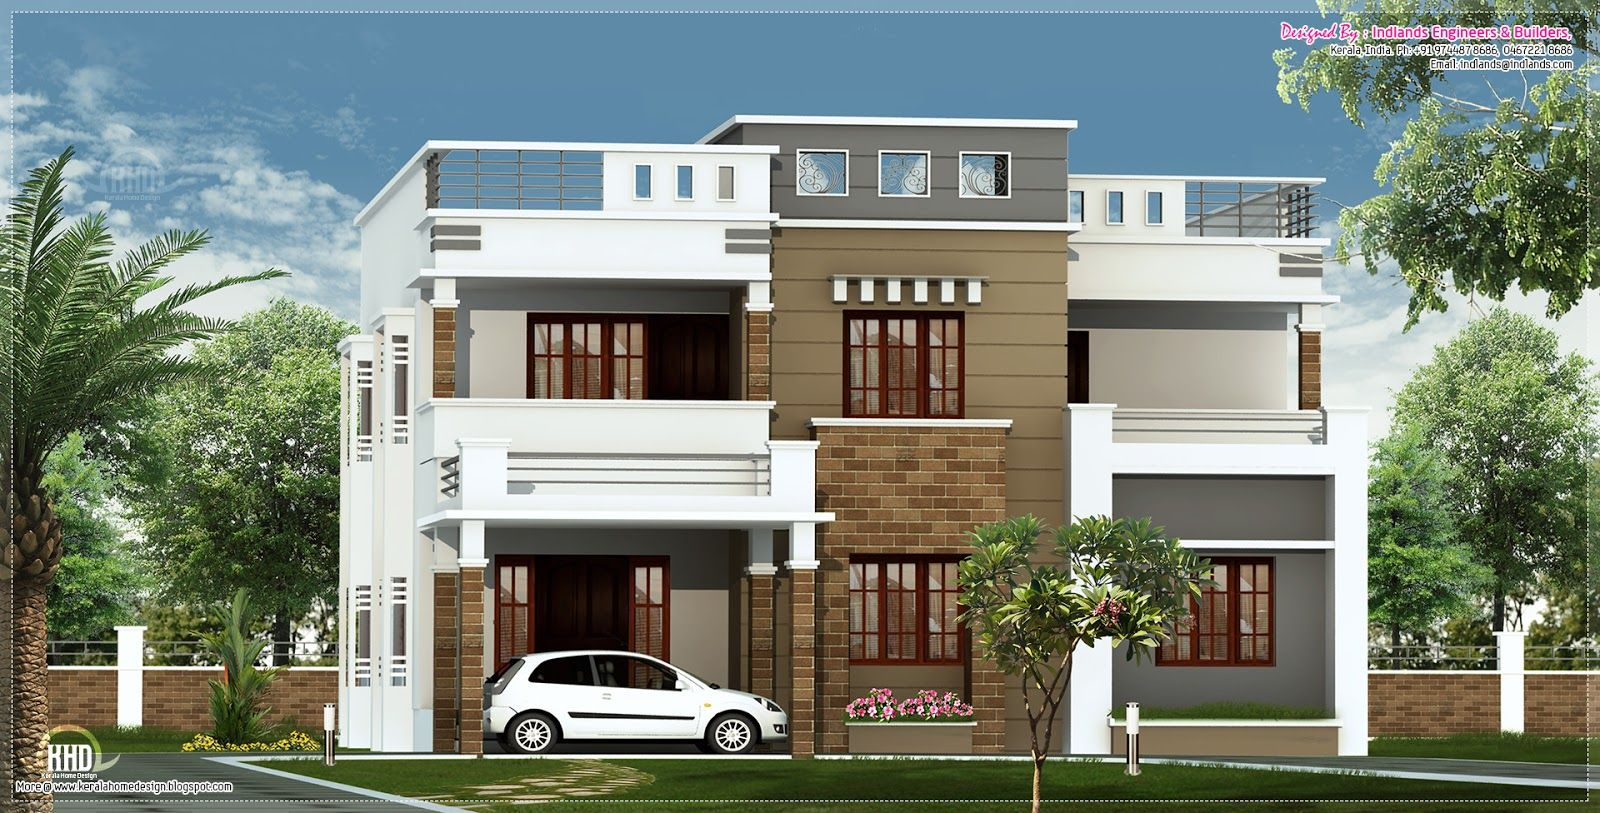 Flat Roof Narrow Front | 1e22655e048311a1 Narrow Flat Roof Houses Modern Flat  Roof Modern House .